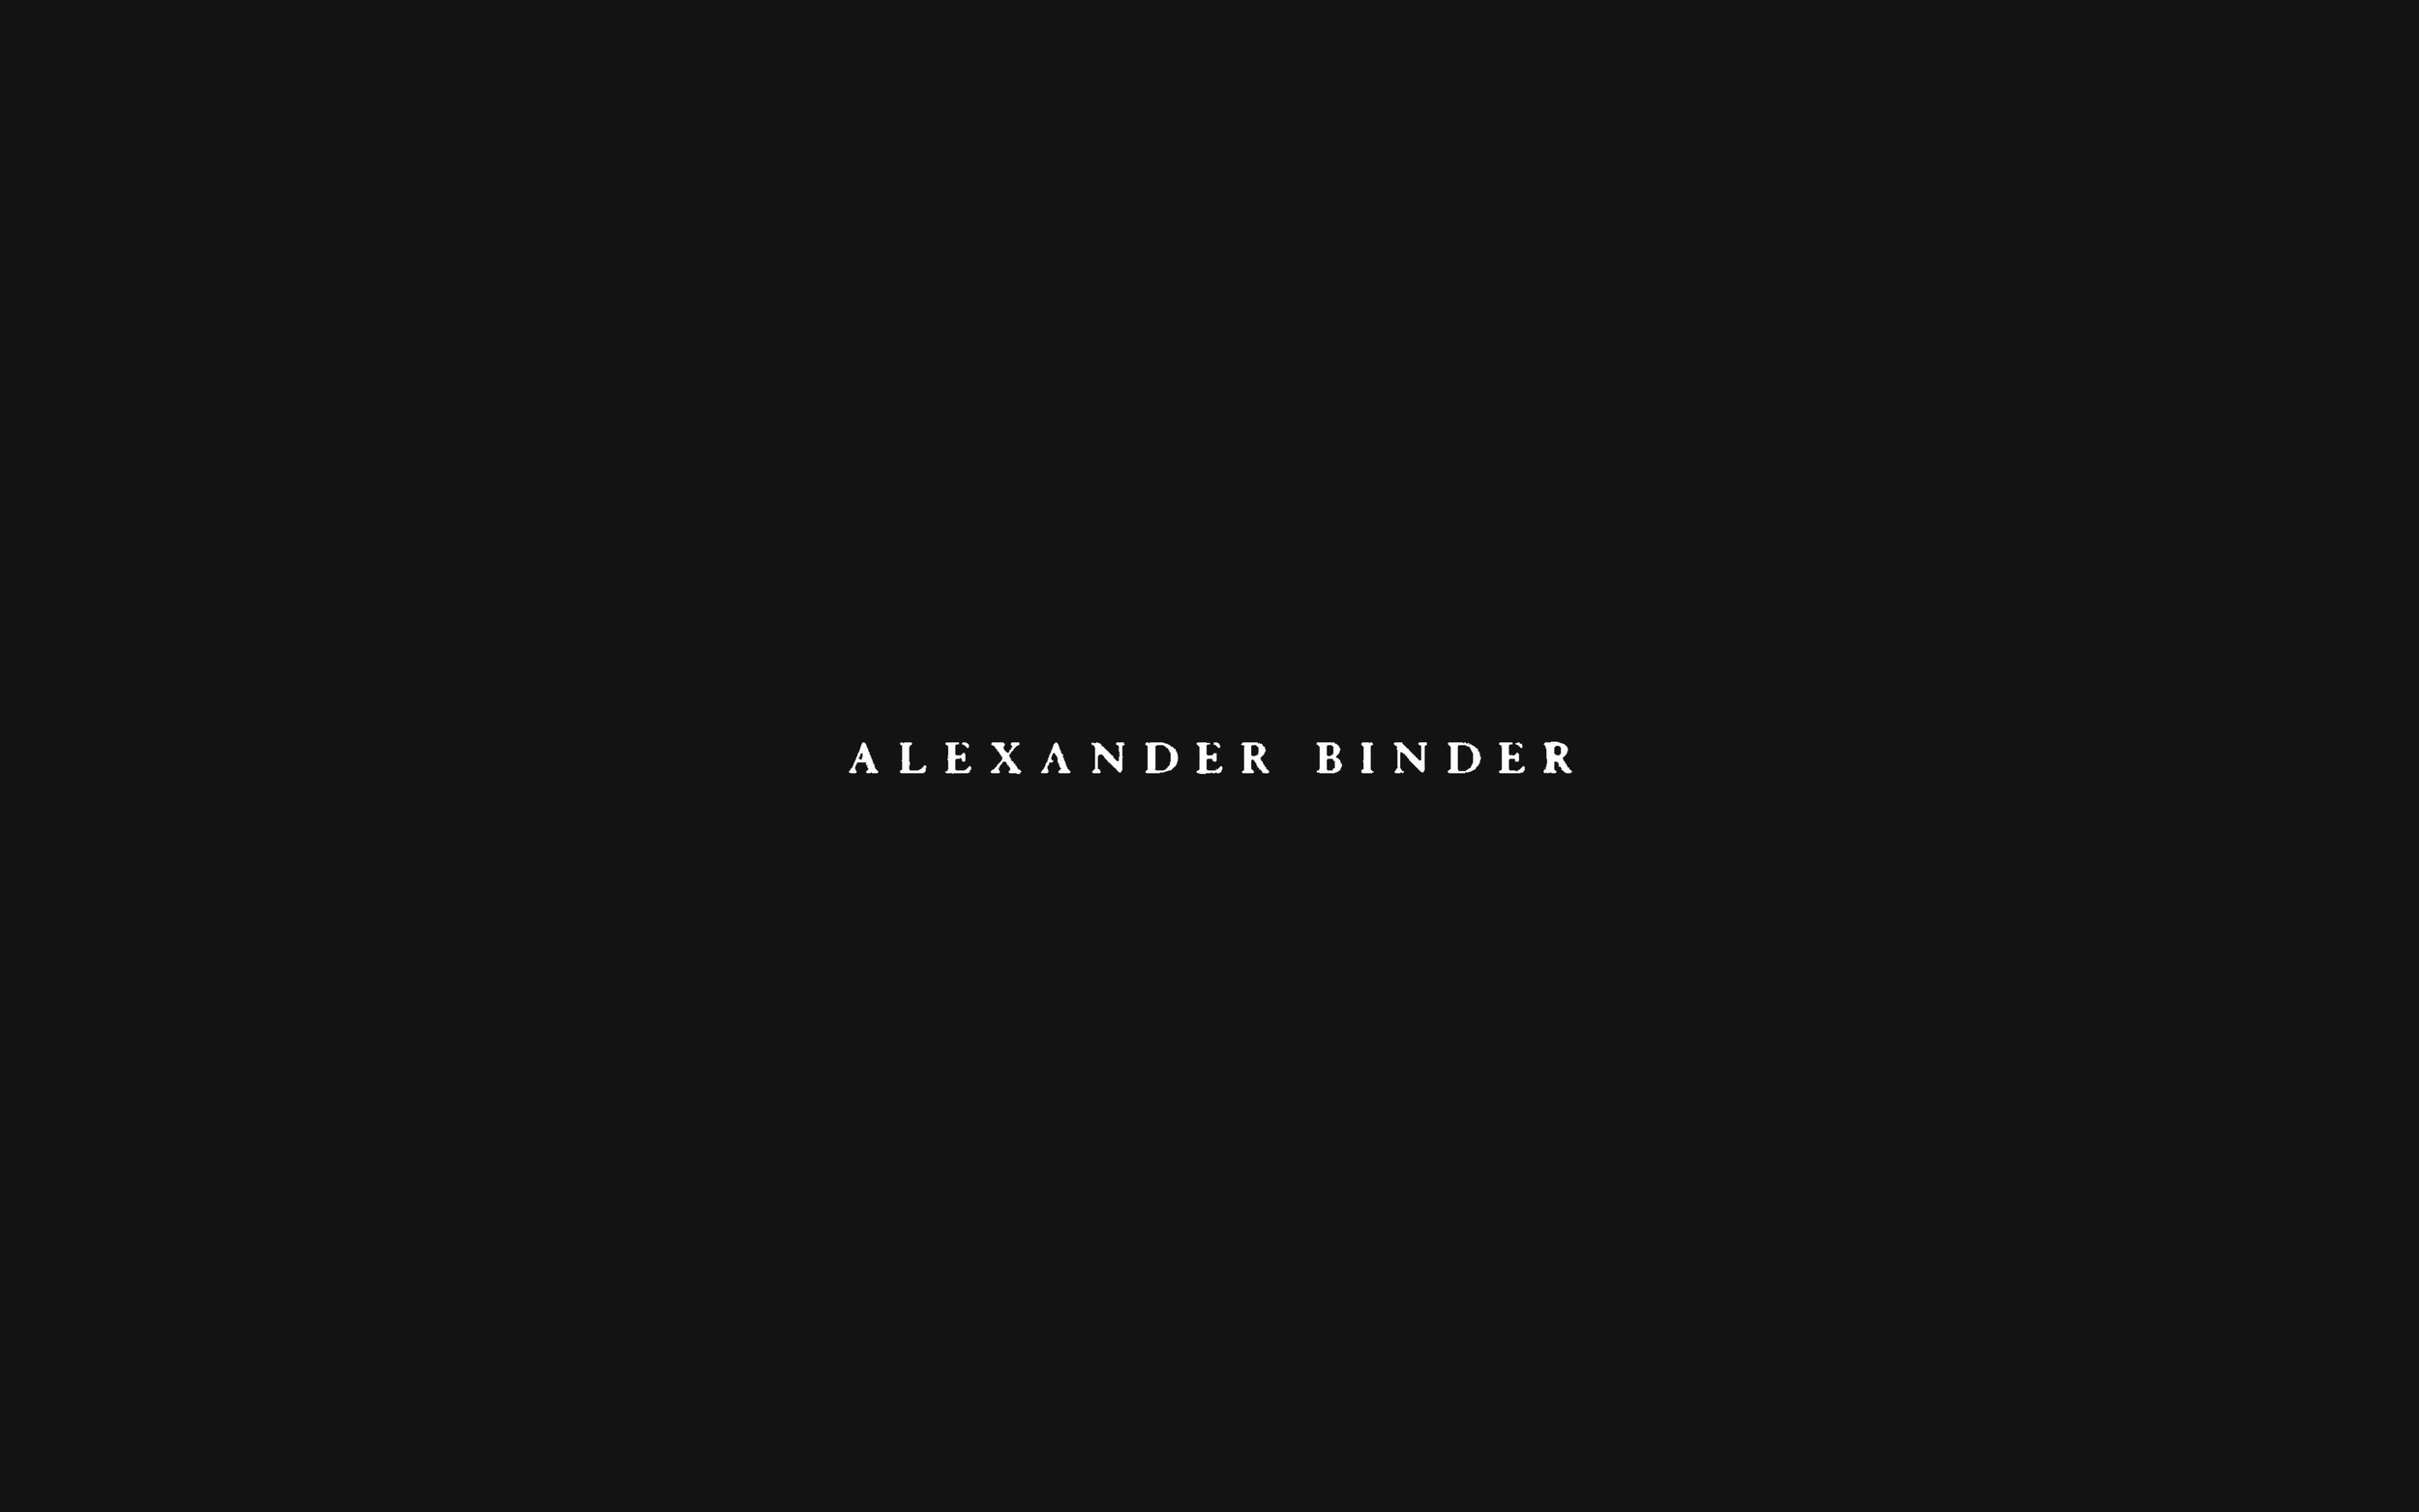 7D__Alexander_Binder_00.jpg